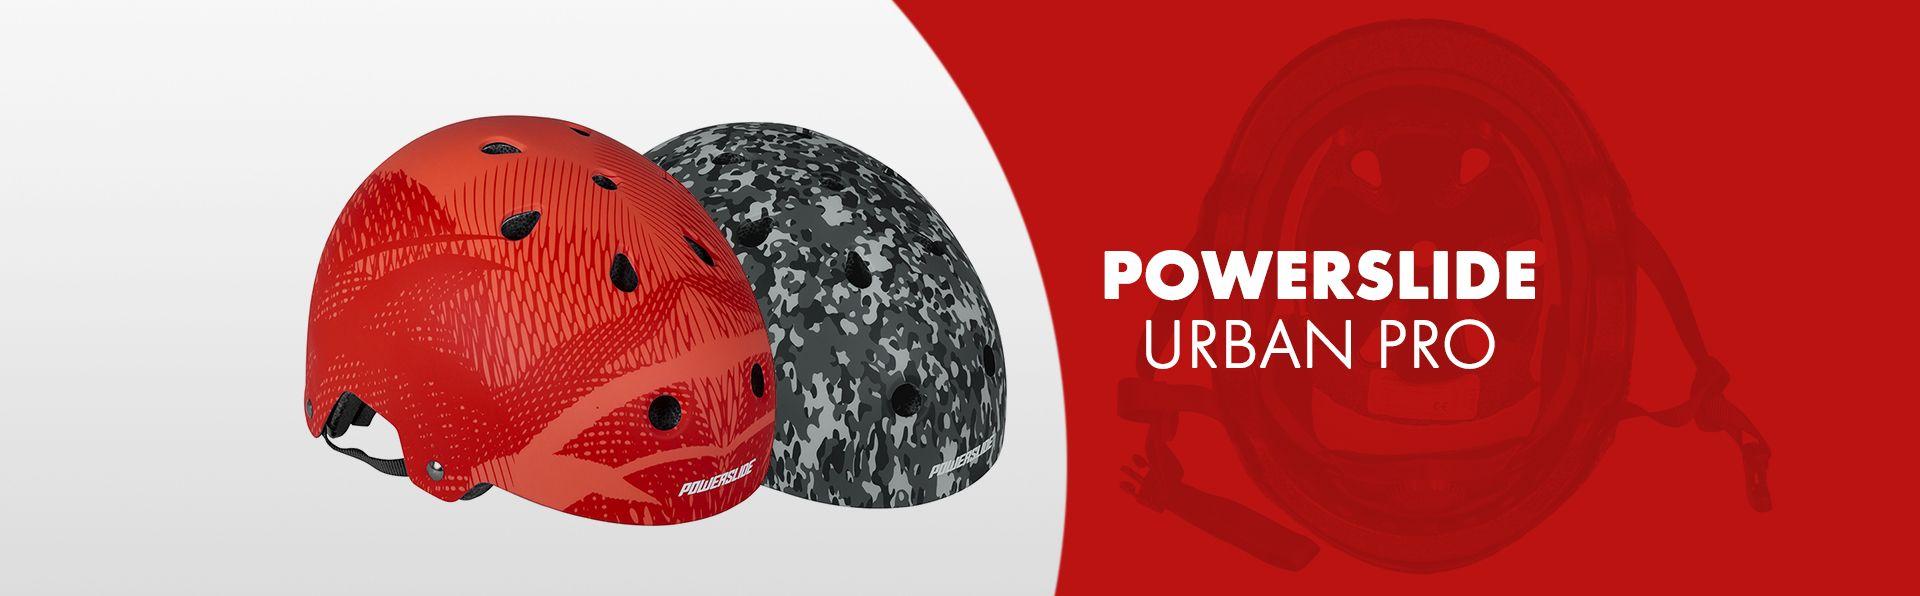 Powerslide - Urban Pro